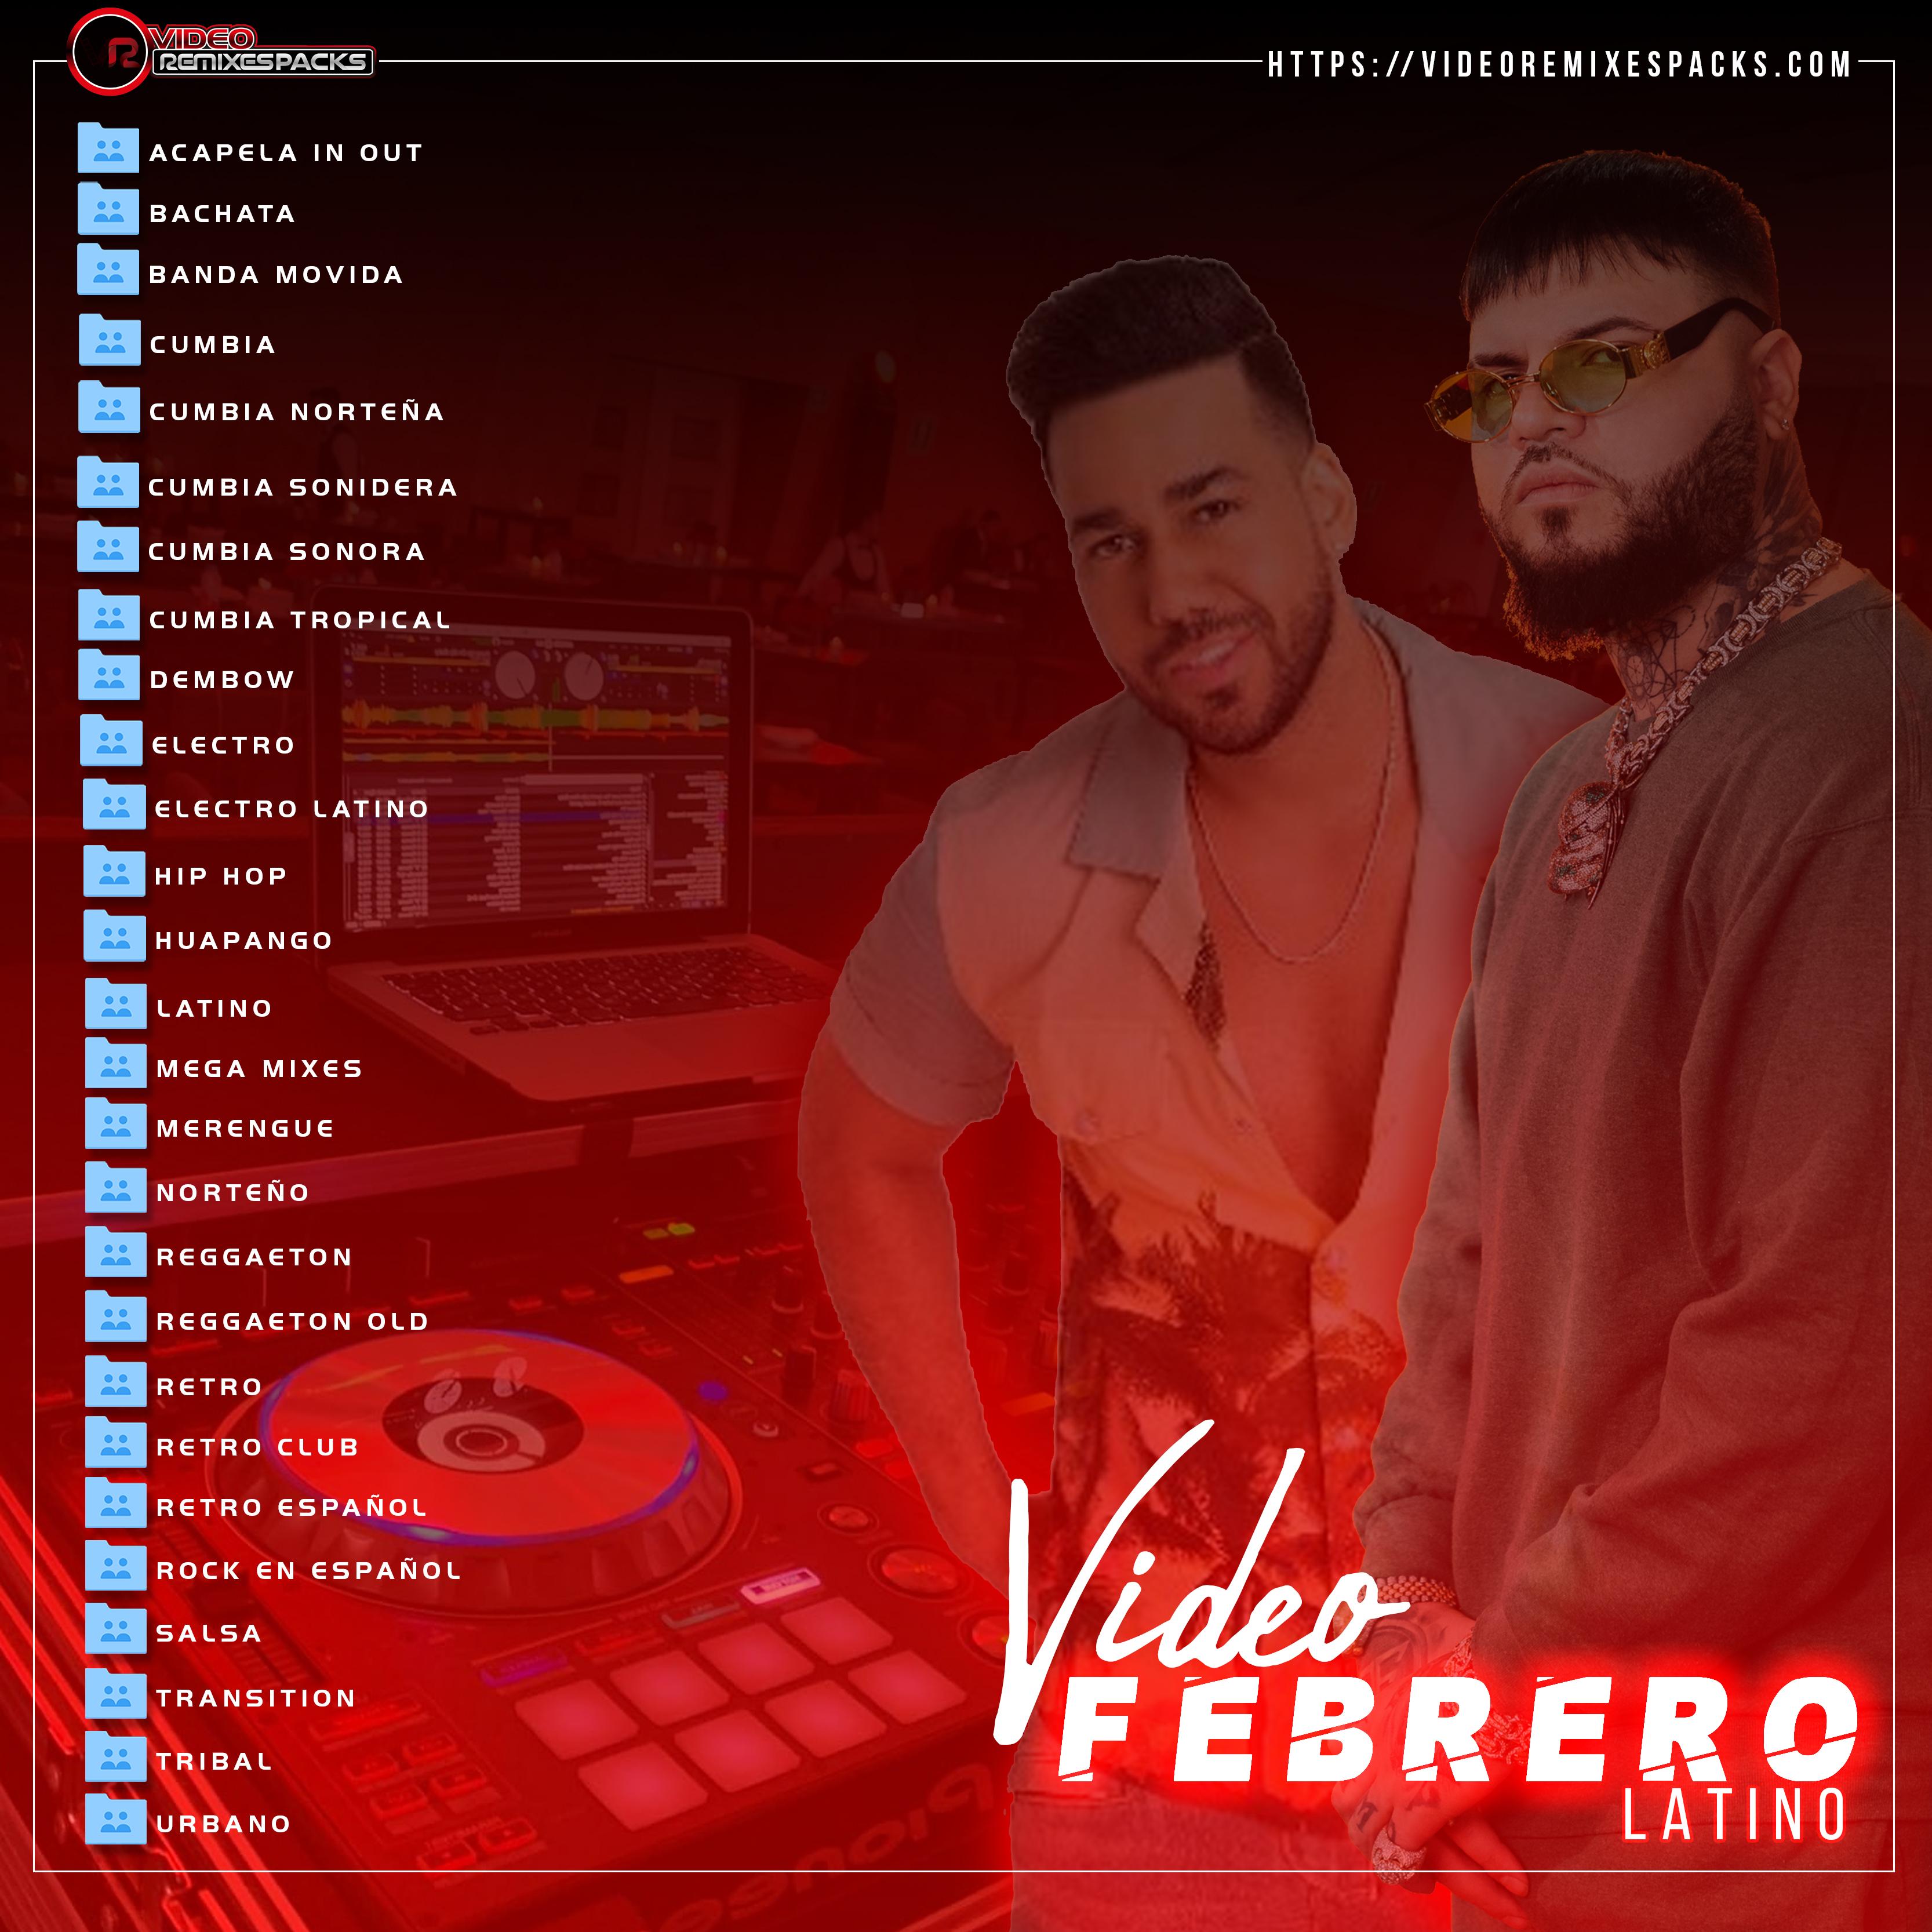 Imagen de Remixes Latinos Febrero Video